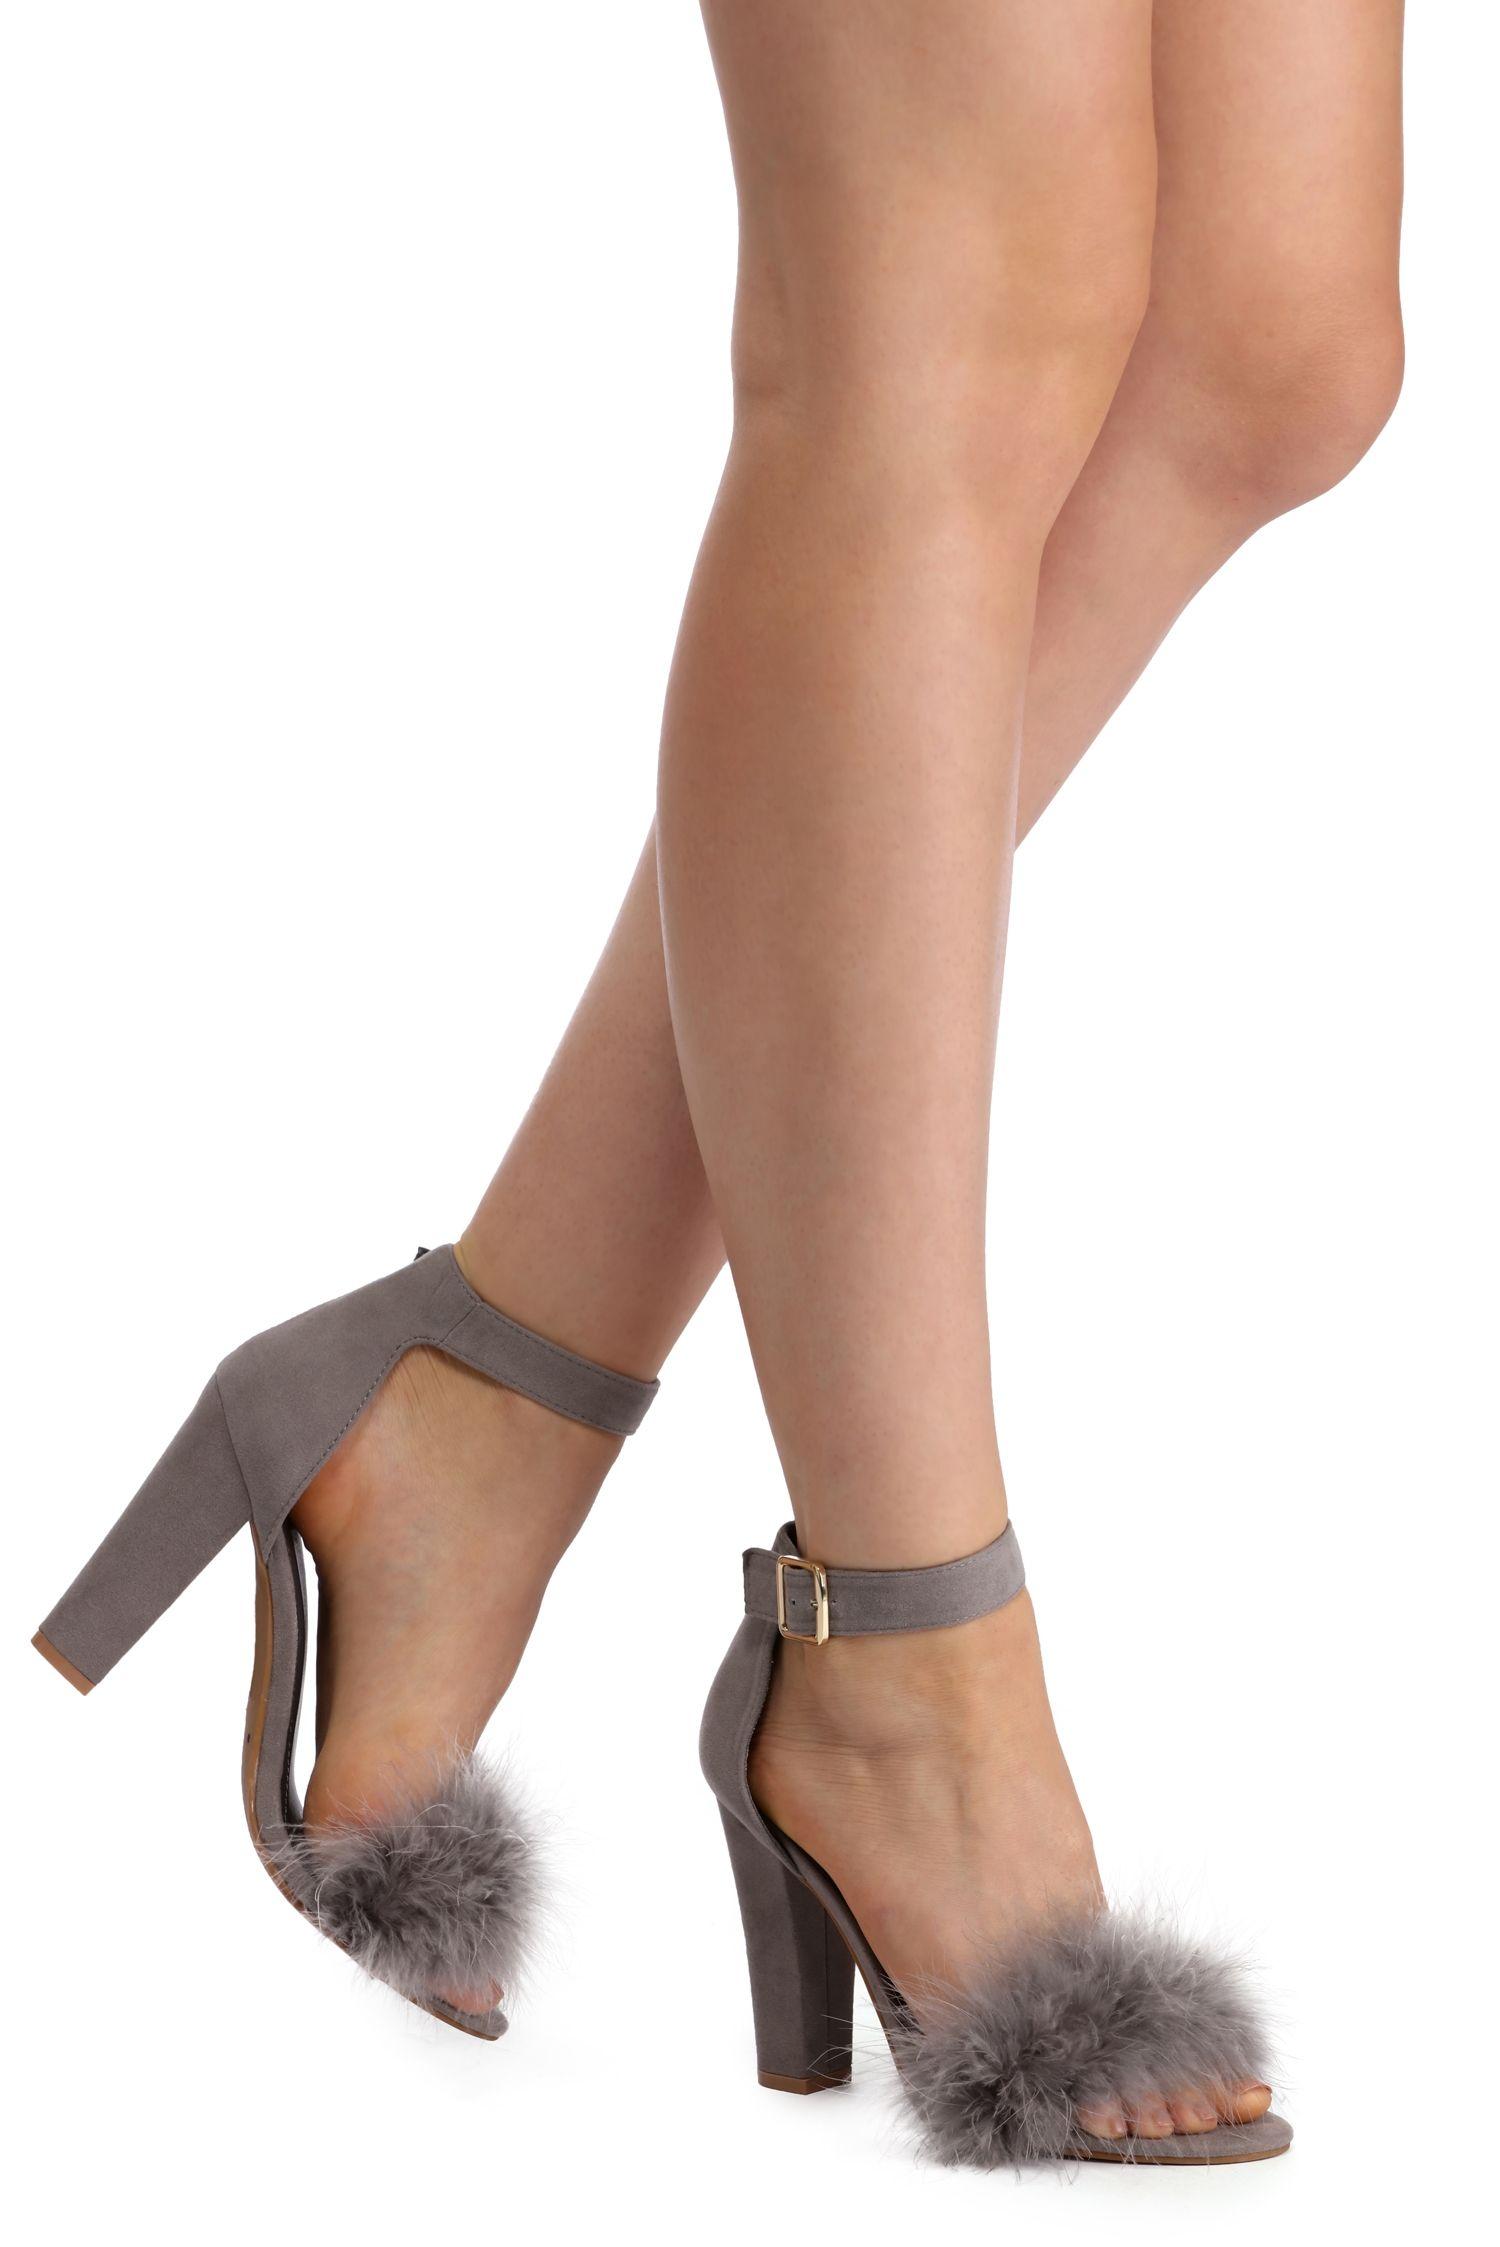 Kick It Up a Notch Feather Heel | Feather heels, Heels